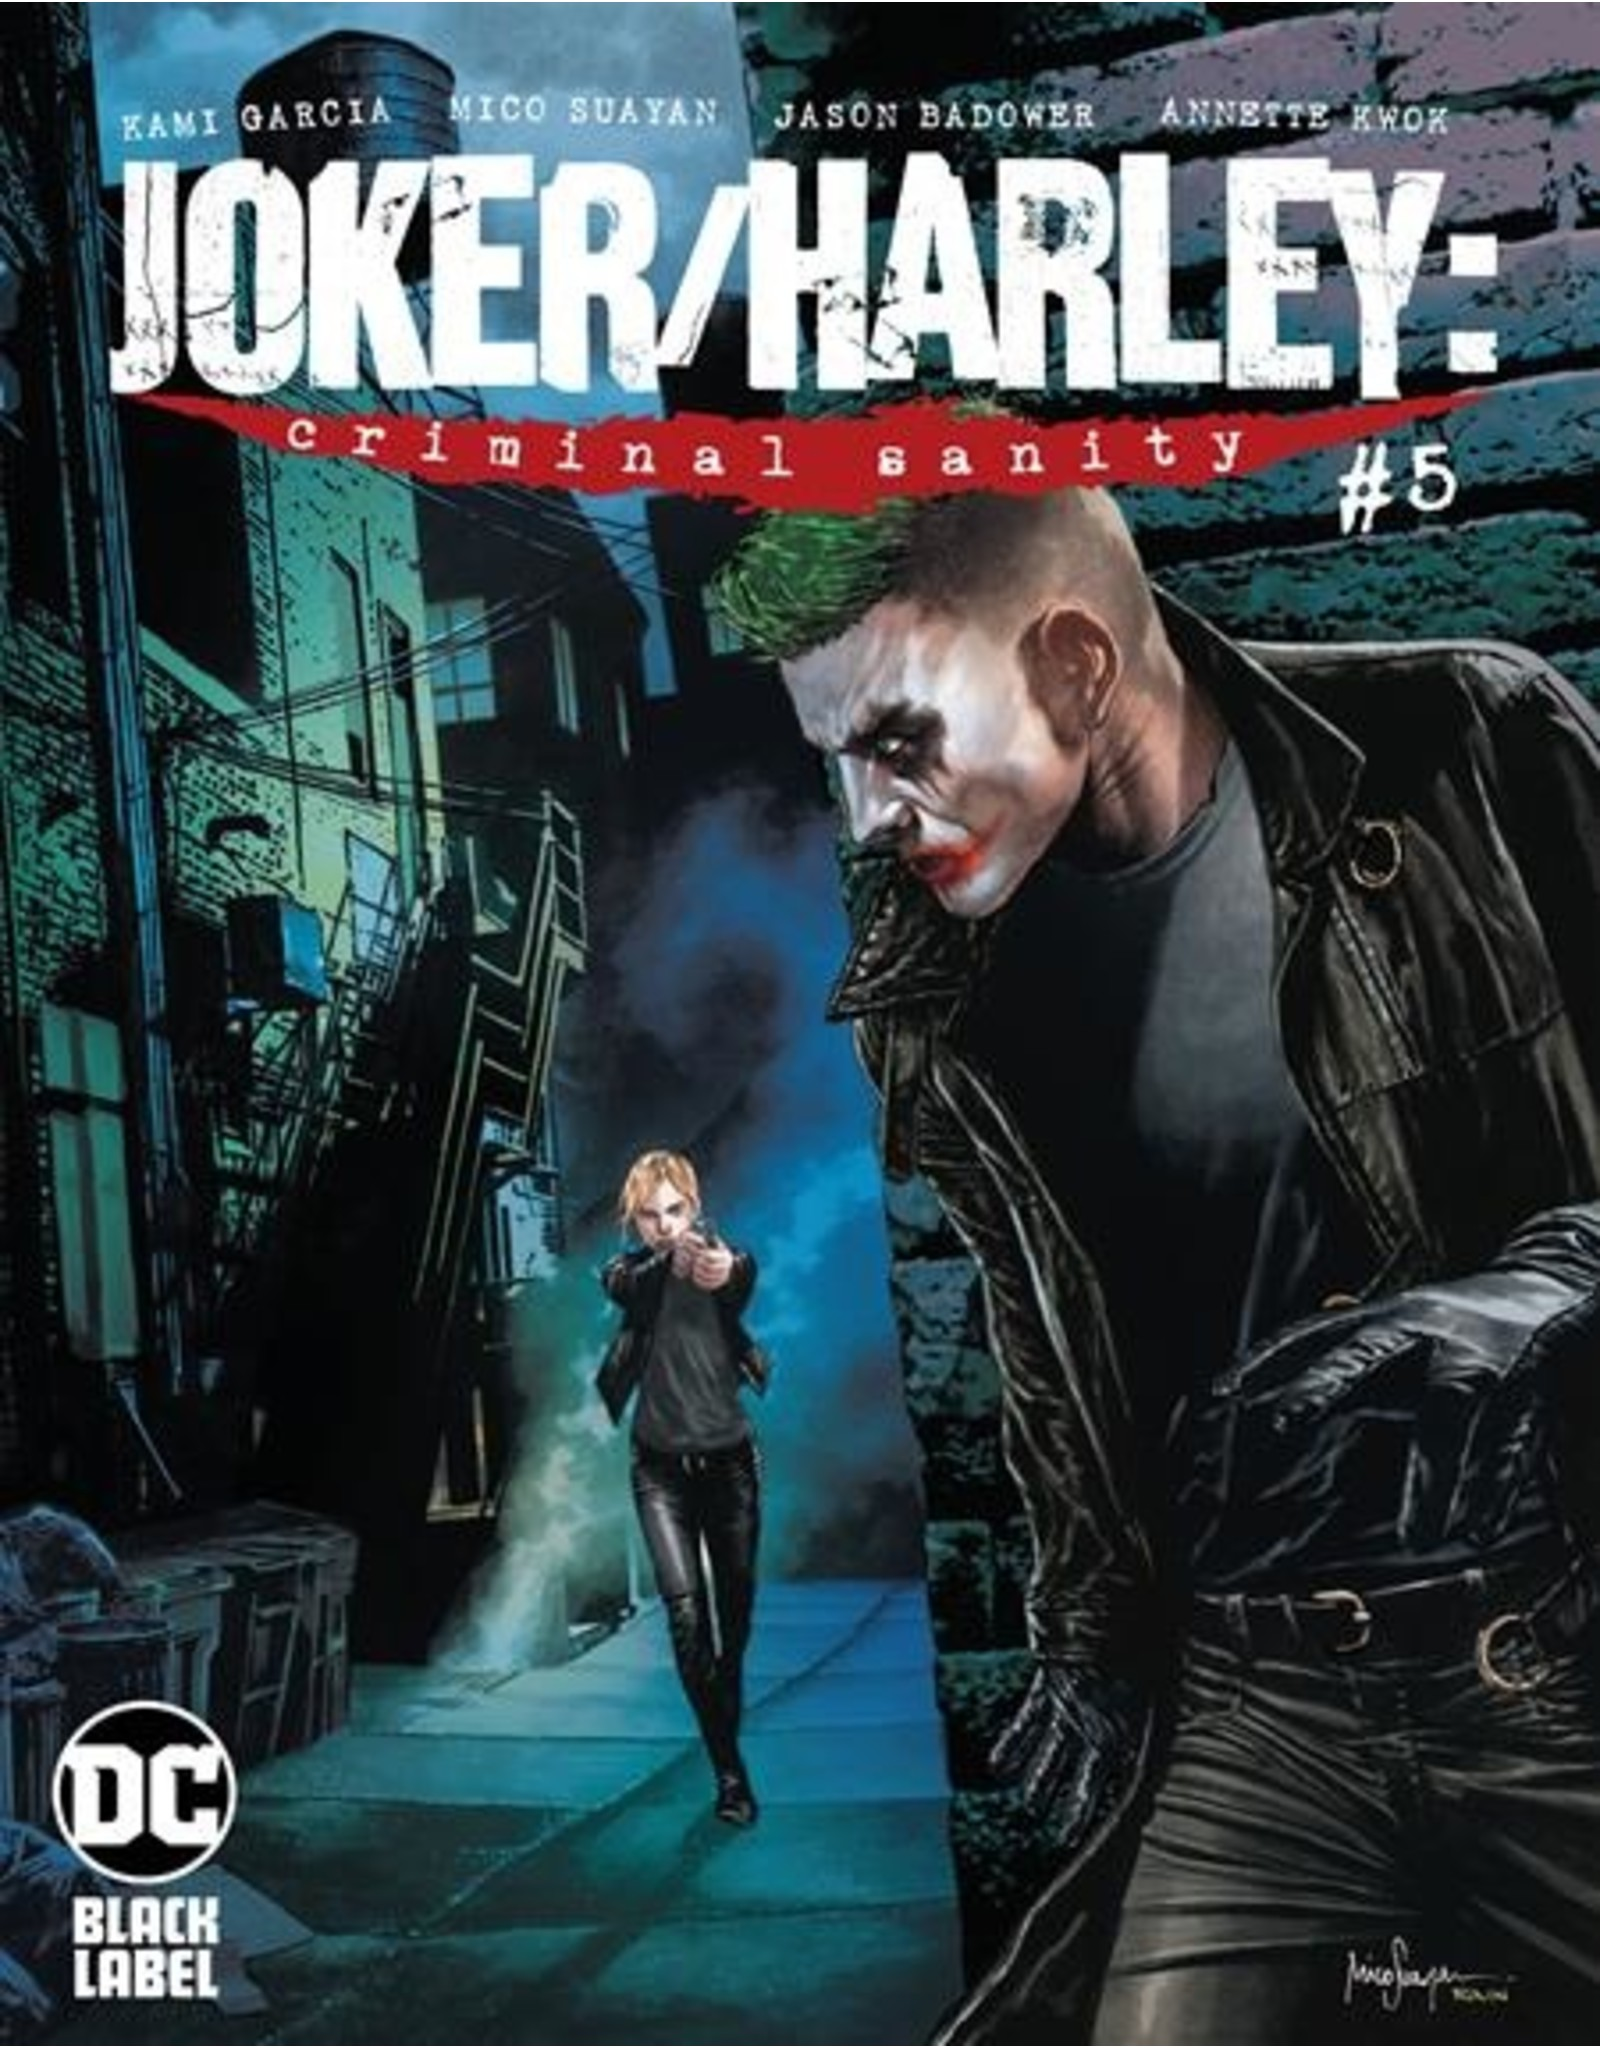 DC COMICS JOKER HARLEY CRIMINAL SANITY #5 (OF 9) CVR B MICO SUAYAN VAR